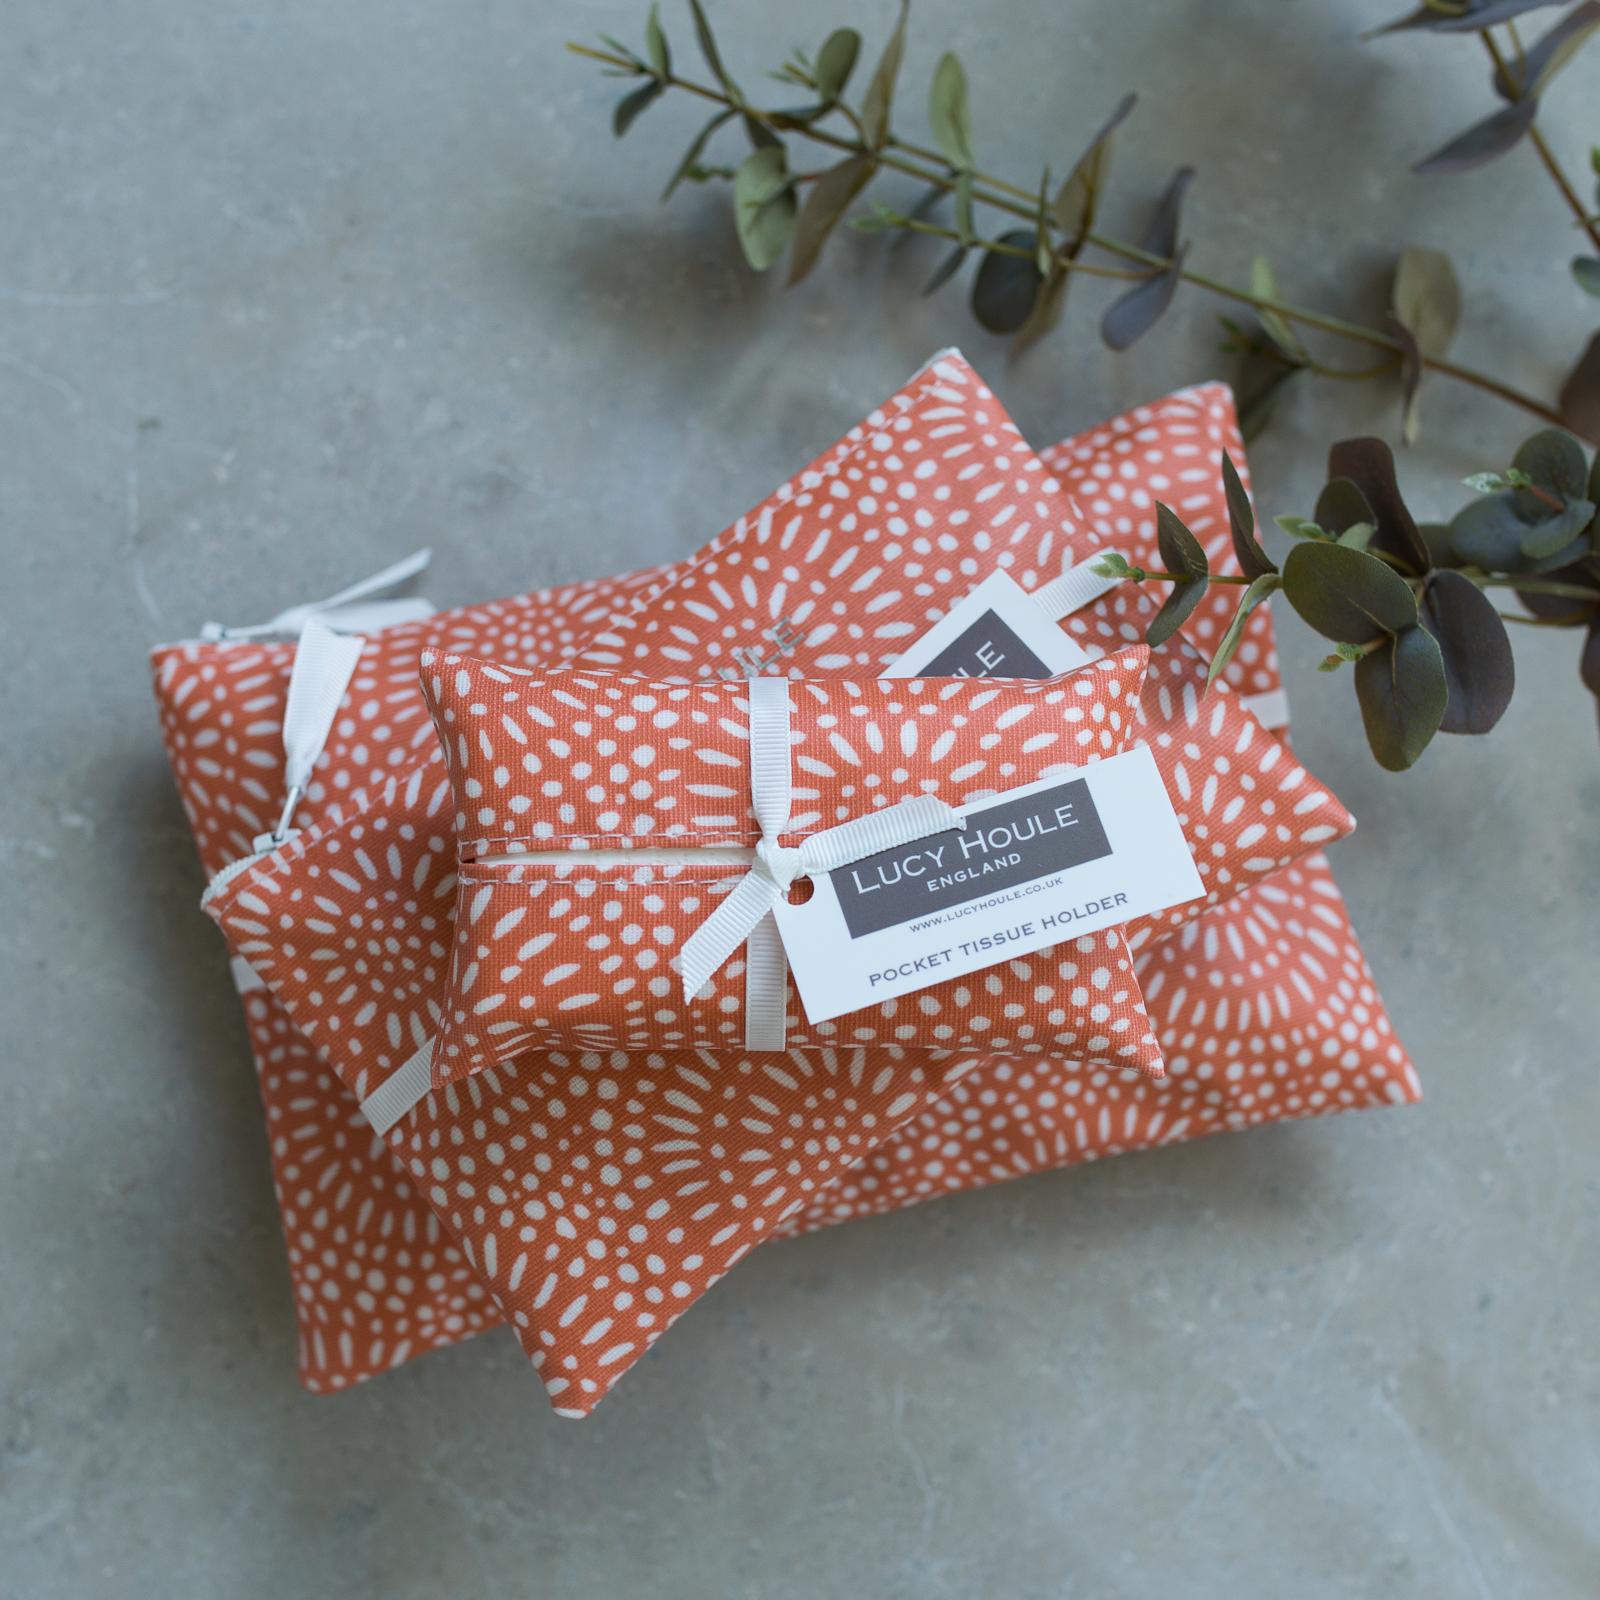 Amber Sunburst Make-Up Bag with White Zip